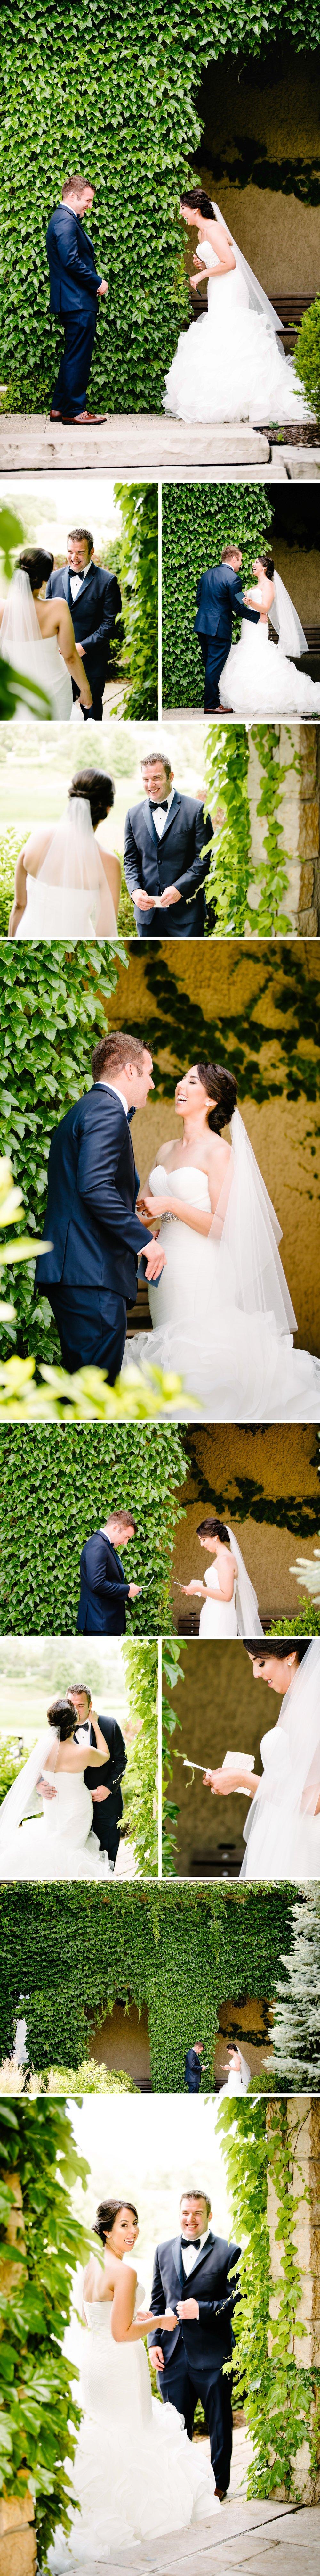 chicago-fine-art-wedding-photography-burdi2